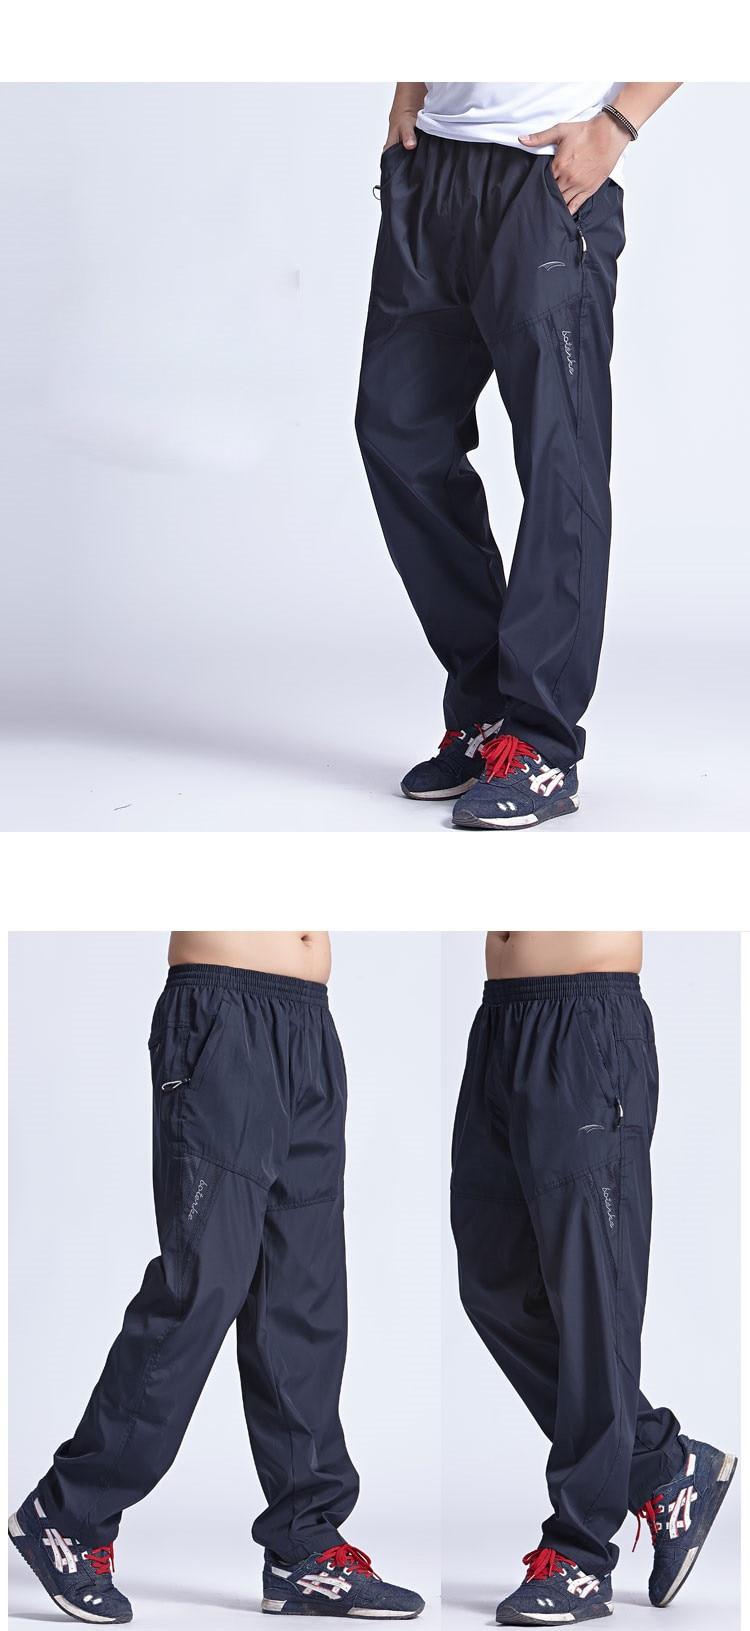 New Quickly Dry Breathable Exercise Pants Men Elastic Waist Men Active Pants Outside Trousers Sportwear Plus Size 3XL,PA095